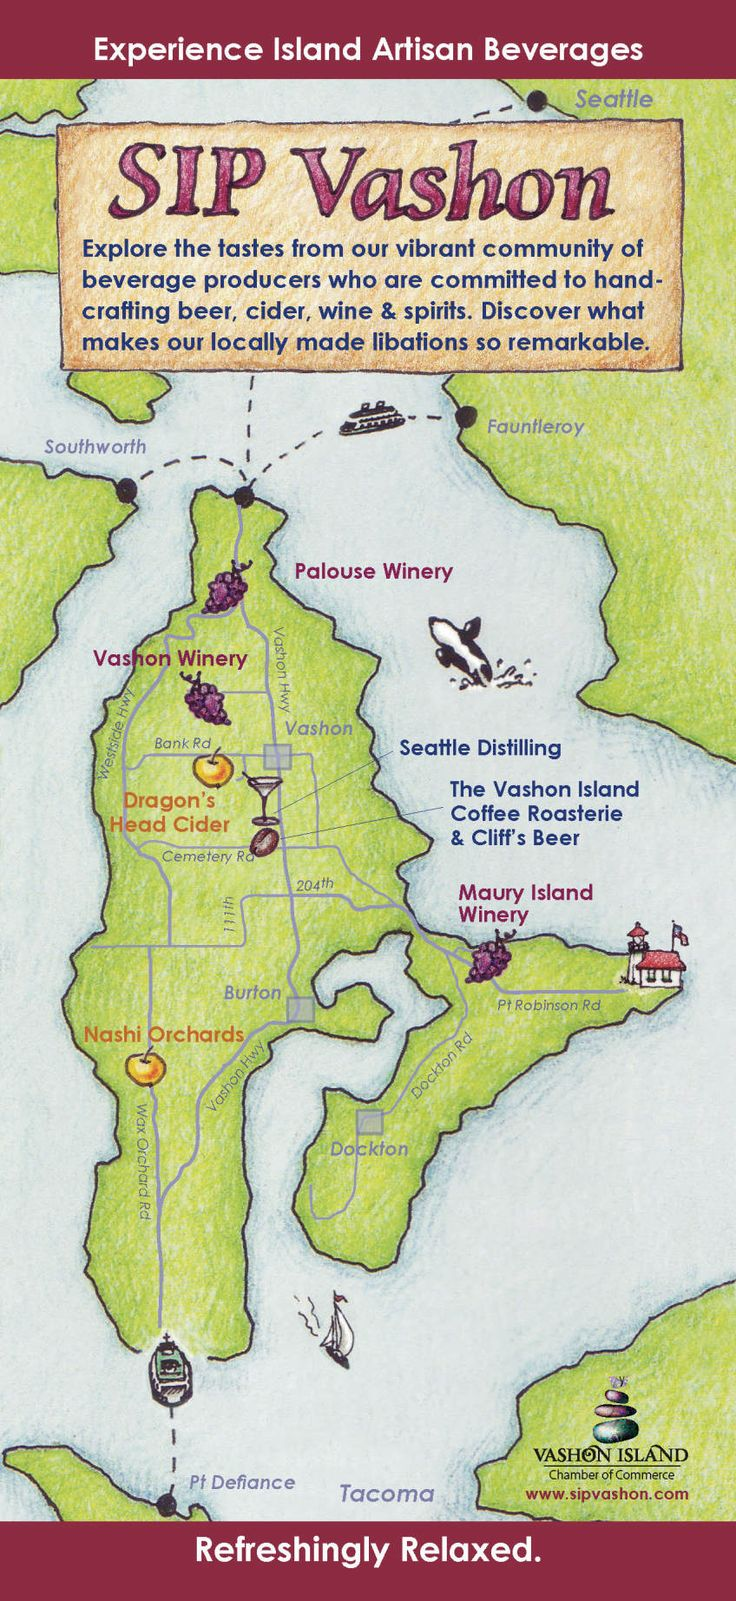 Vashon-Maury Island Chamber of Commerce - Sip Vashon